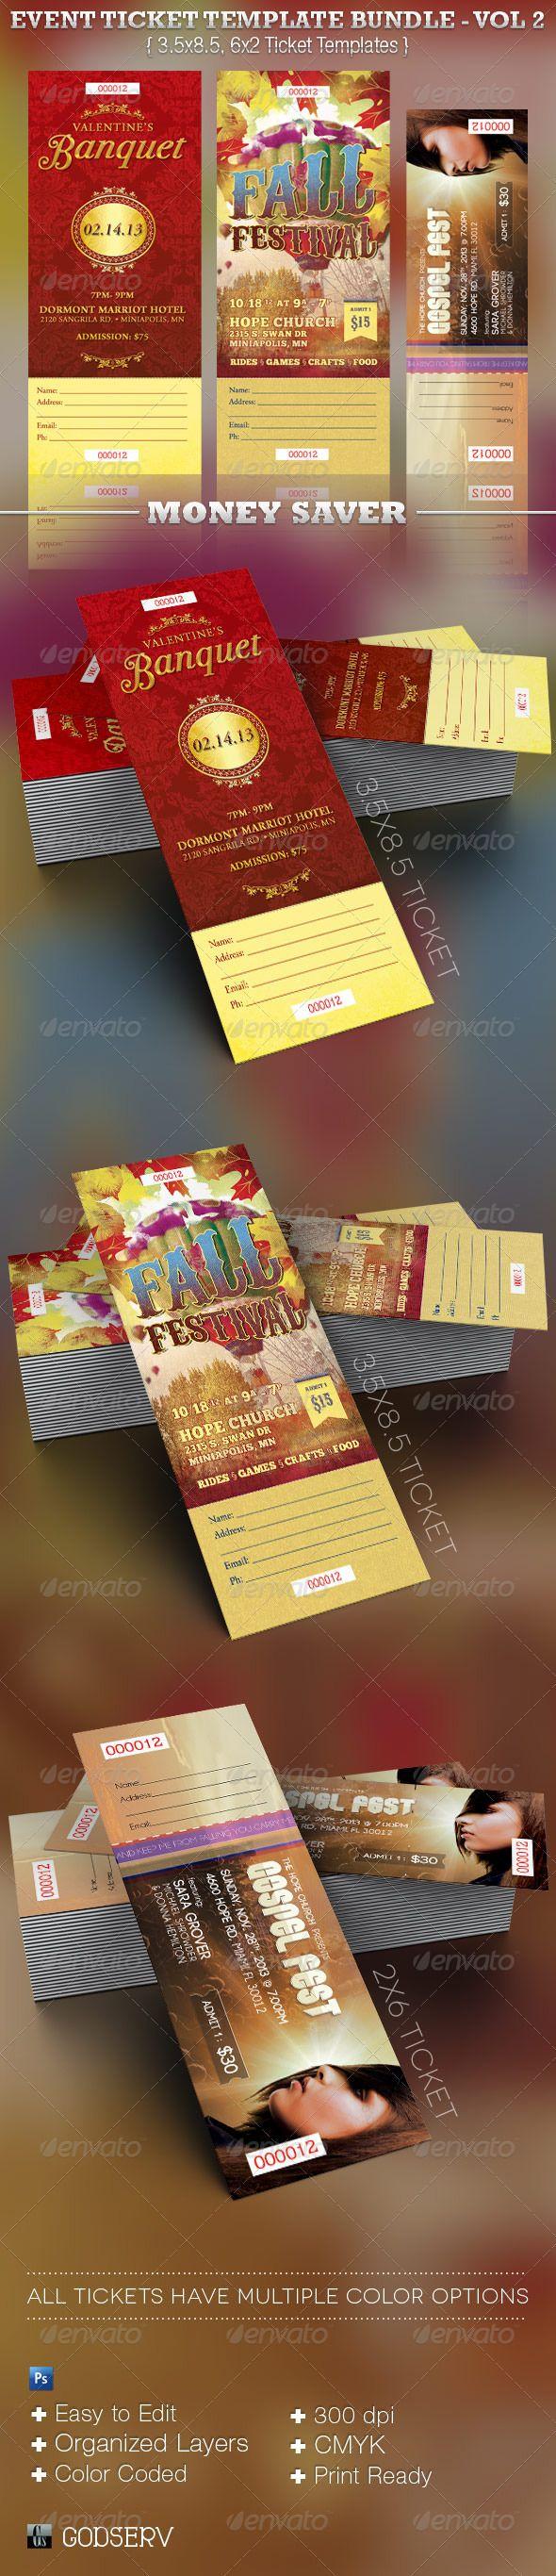 Event Ticket Template Bundle - Volume 2 - $11.00